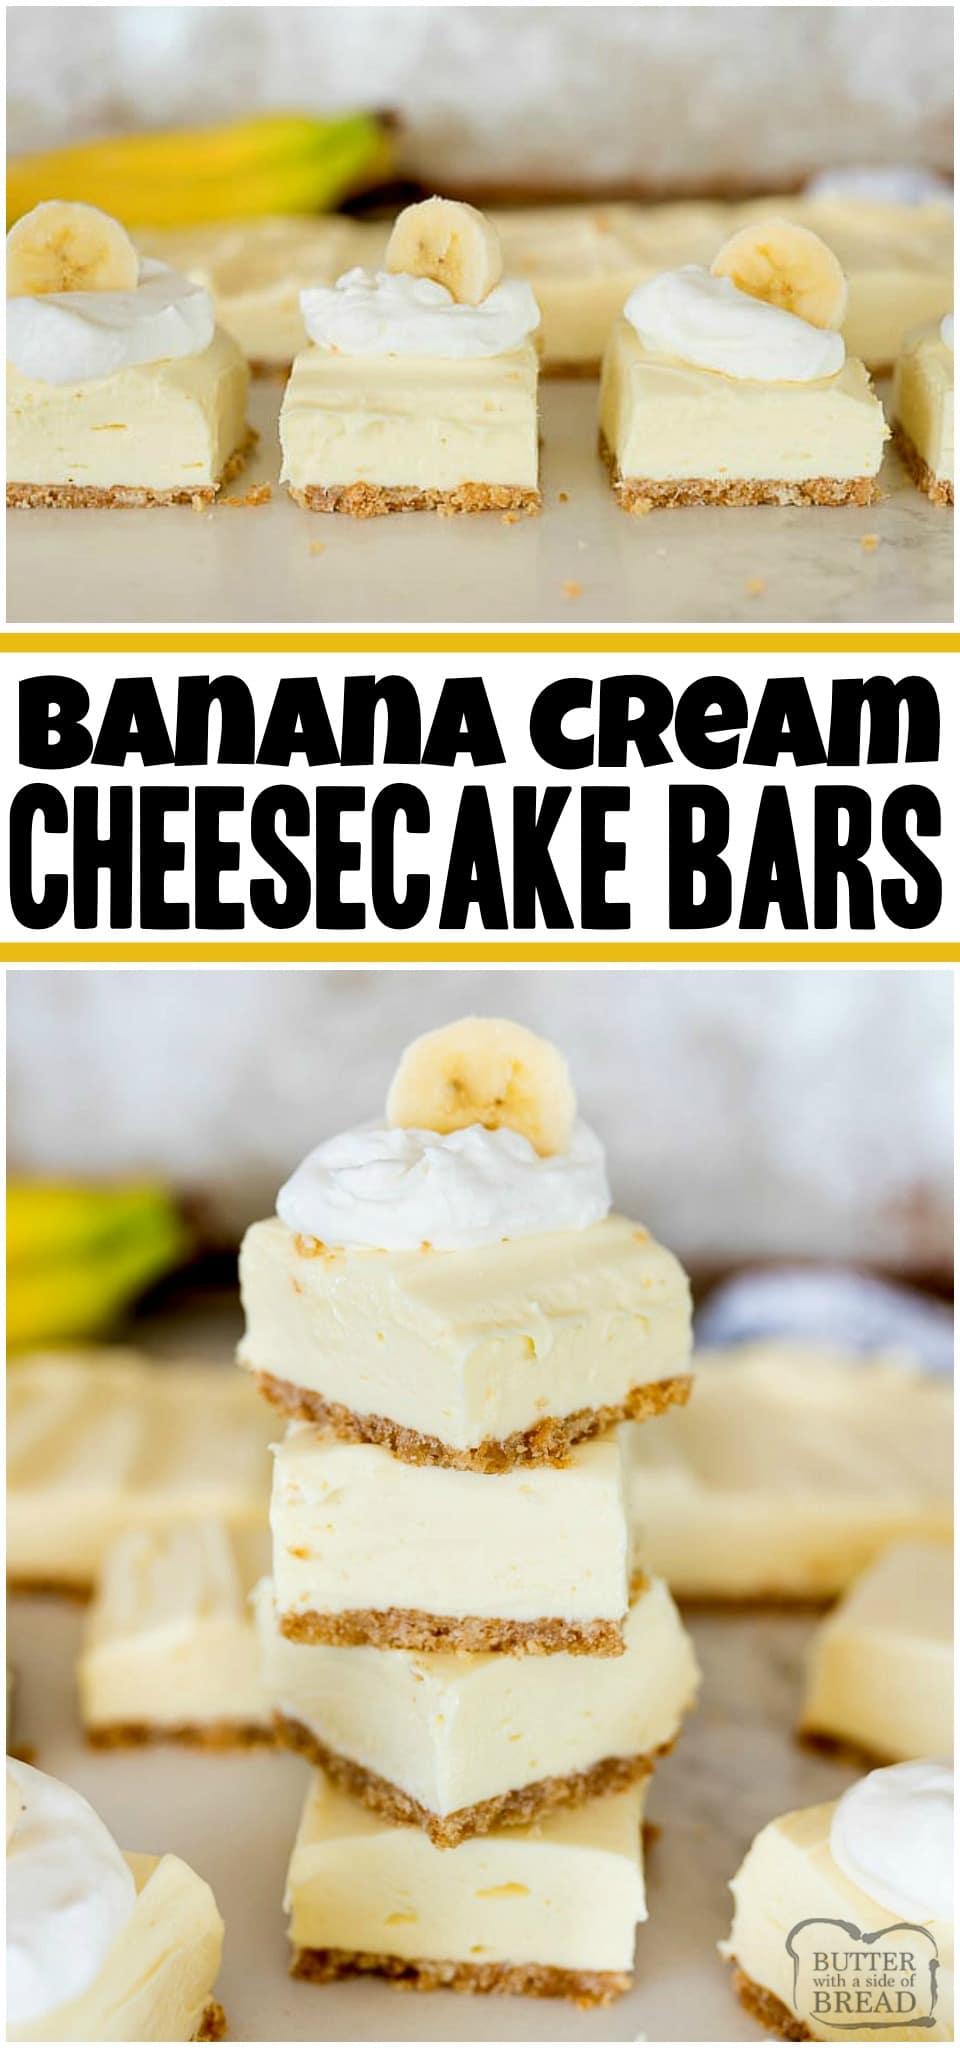 Banana Cream Cheesecake Bars is a simple, no bake cheesecake recipe with incredible banana flavor! Easy banana cheesecake recipe that everyone loves! #cheesecake #nobake #dessert #banana #bananacream #bananacheesecake #recipe from BUTTER WITH A SIDE OF BREAD